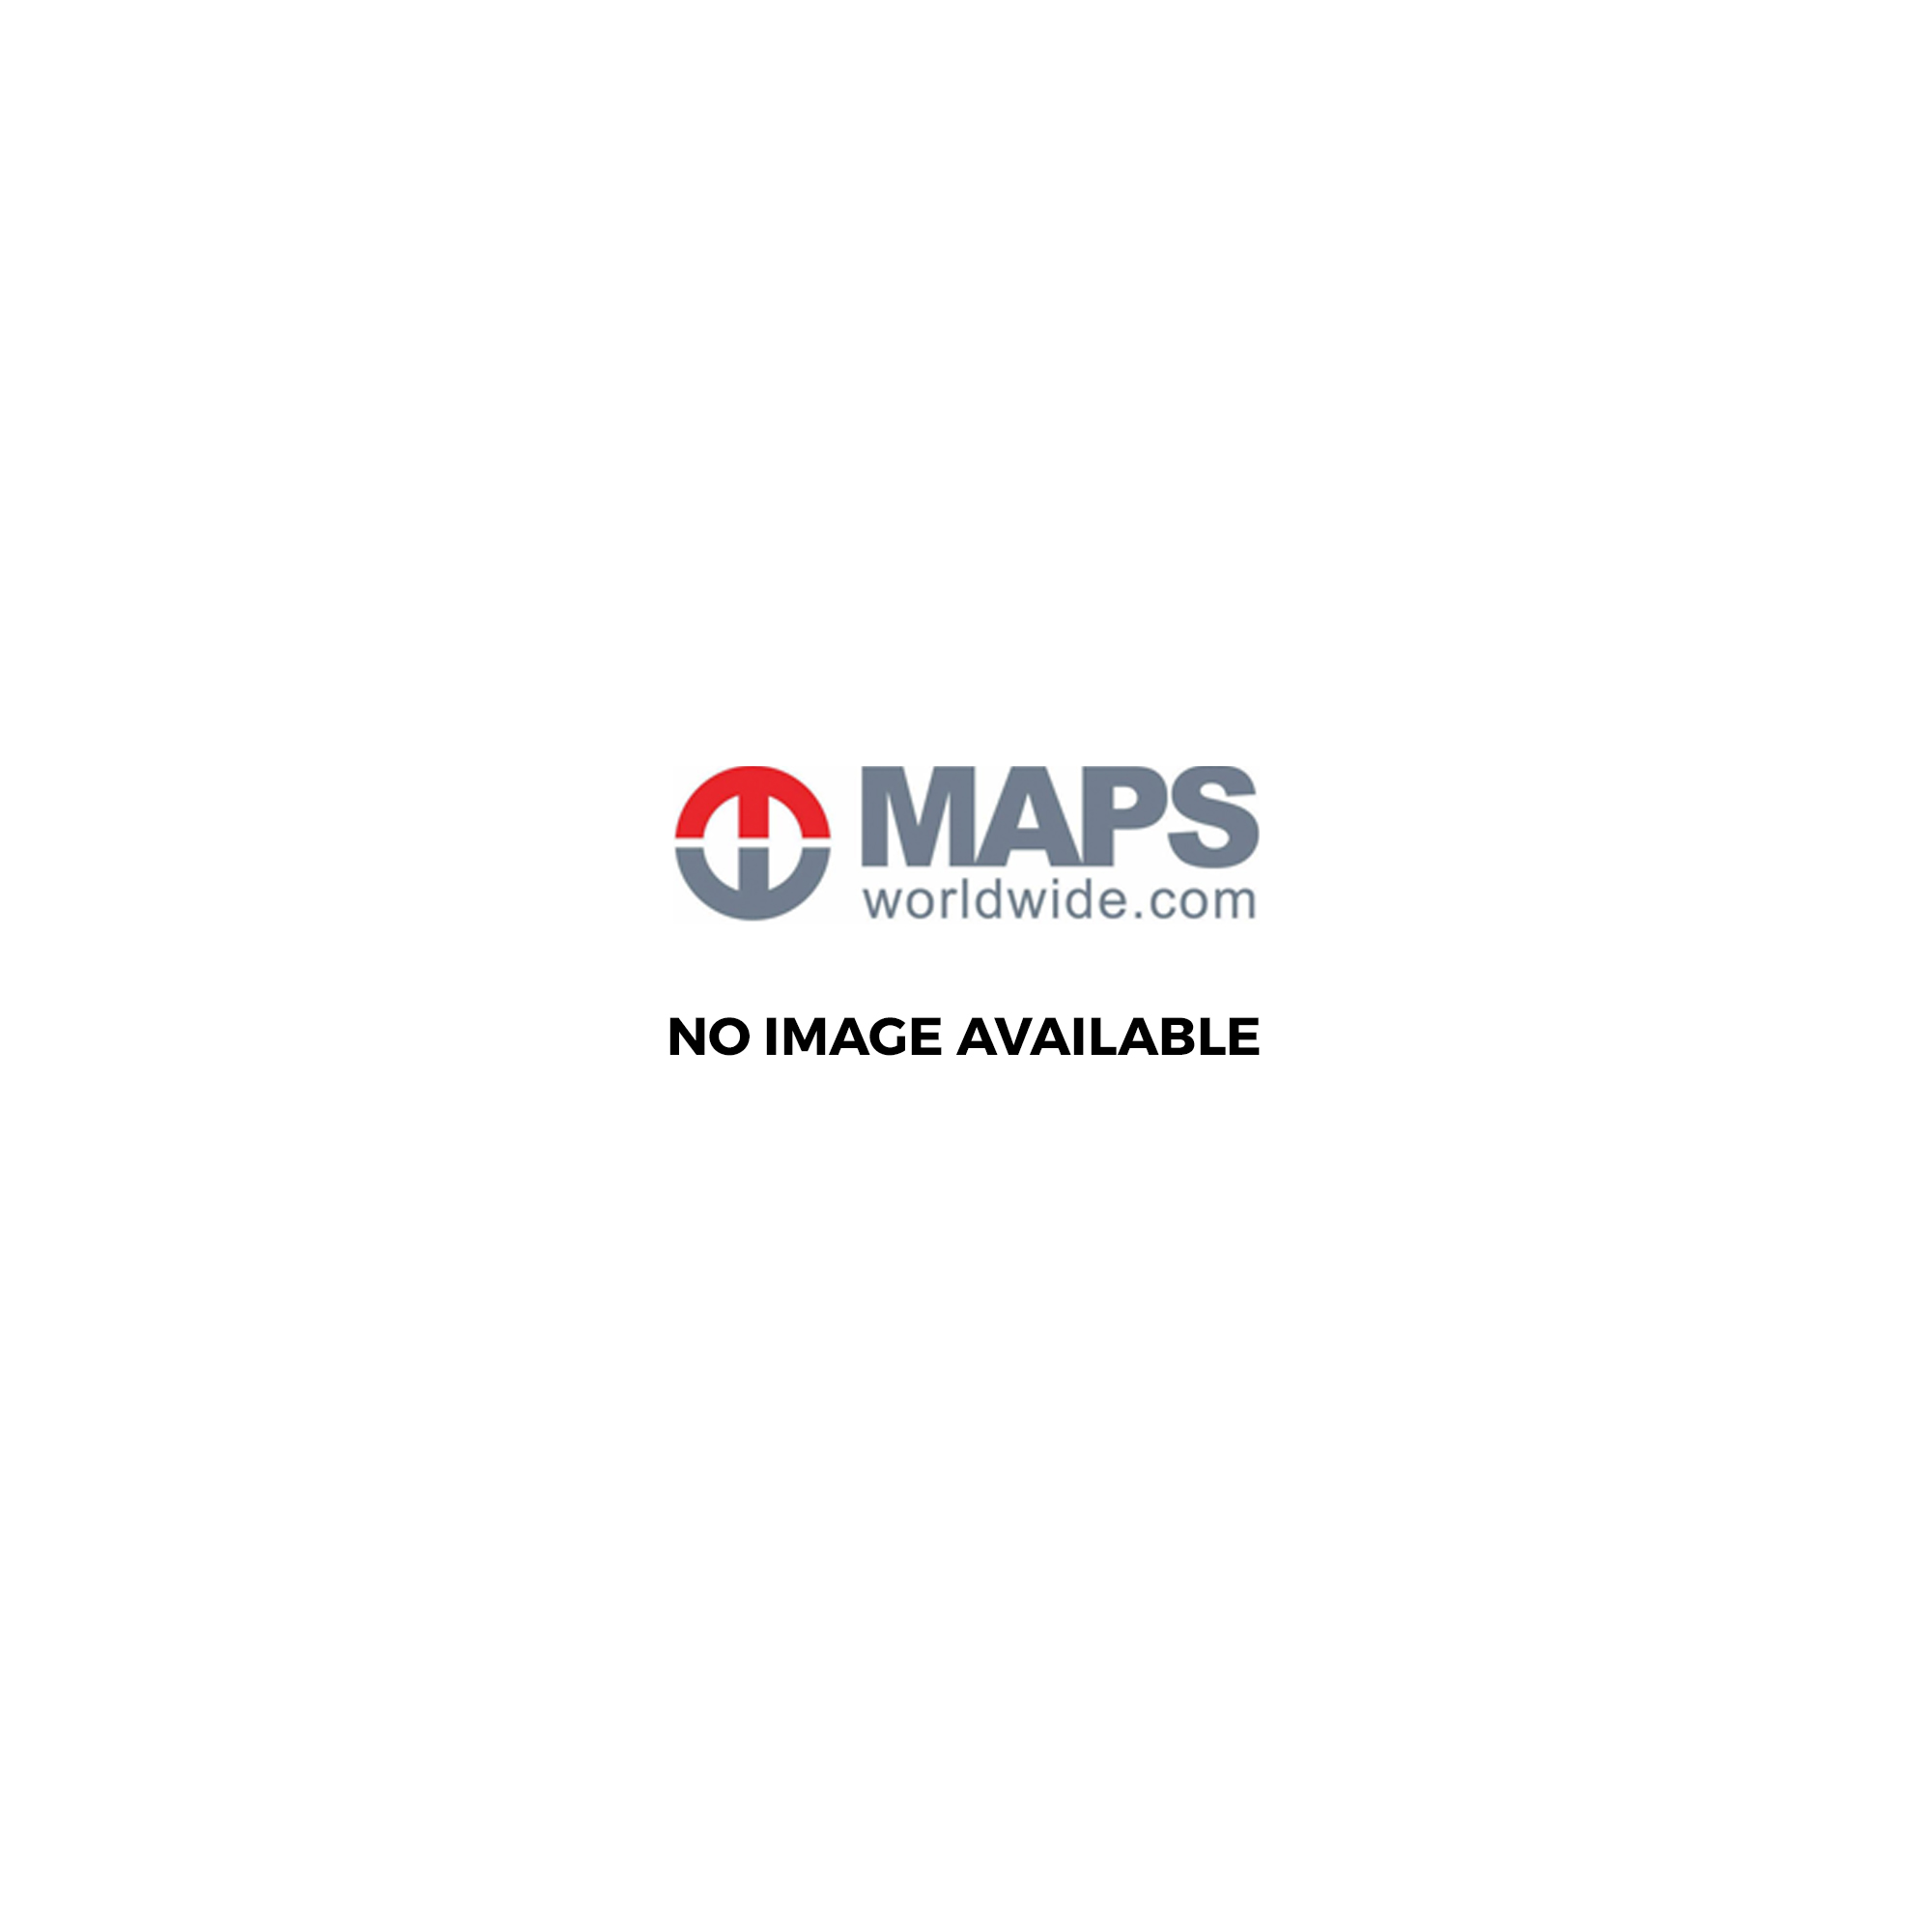 Map Of Italy Abruzzo Region.Regional Road Map Of Italy 11 Abruzzo Molise Published By Hallwag